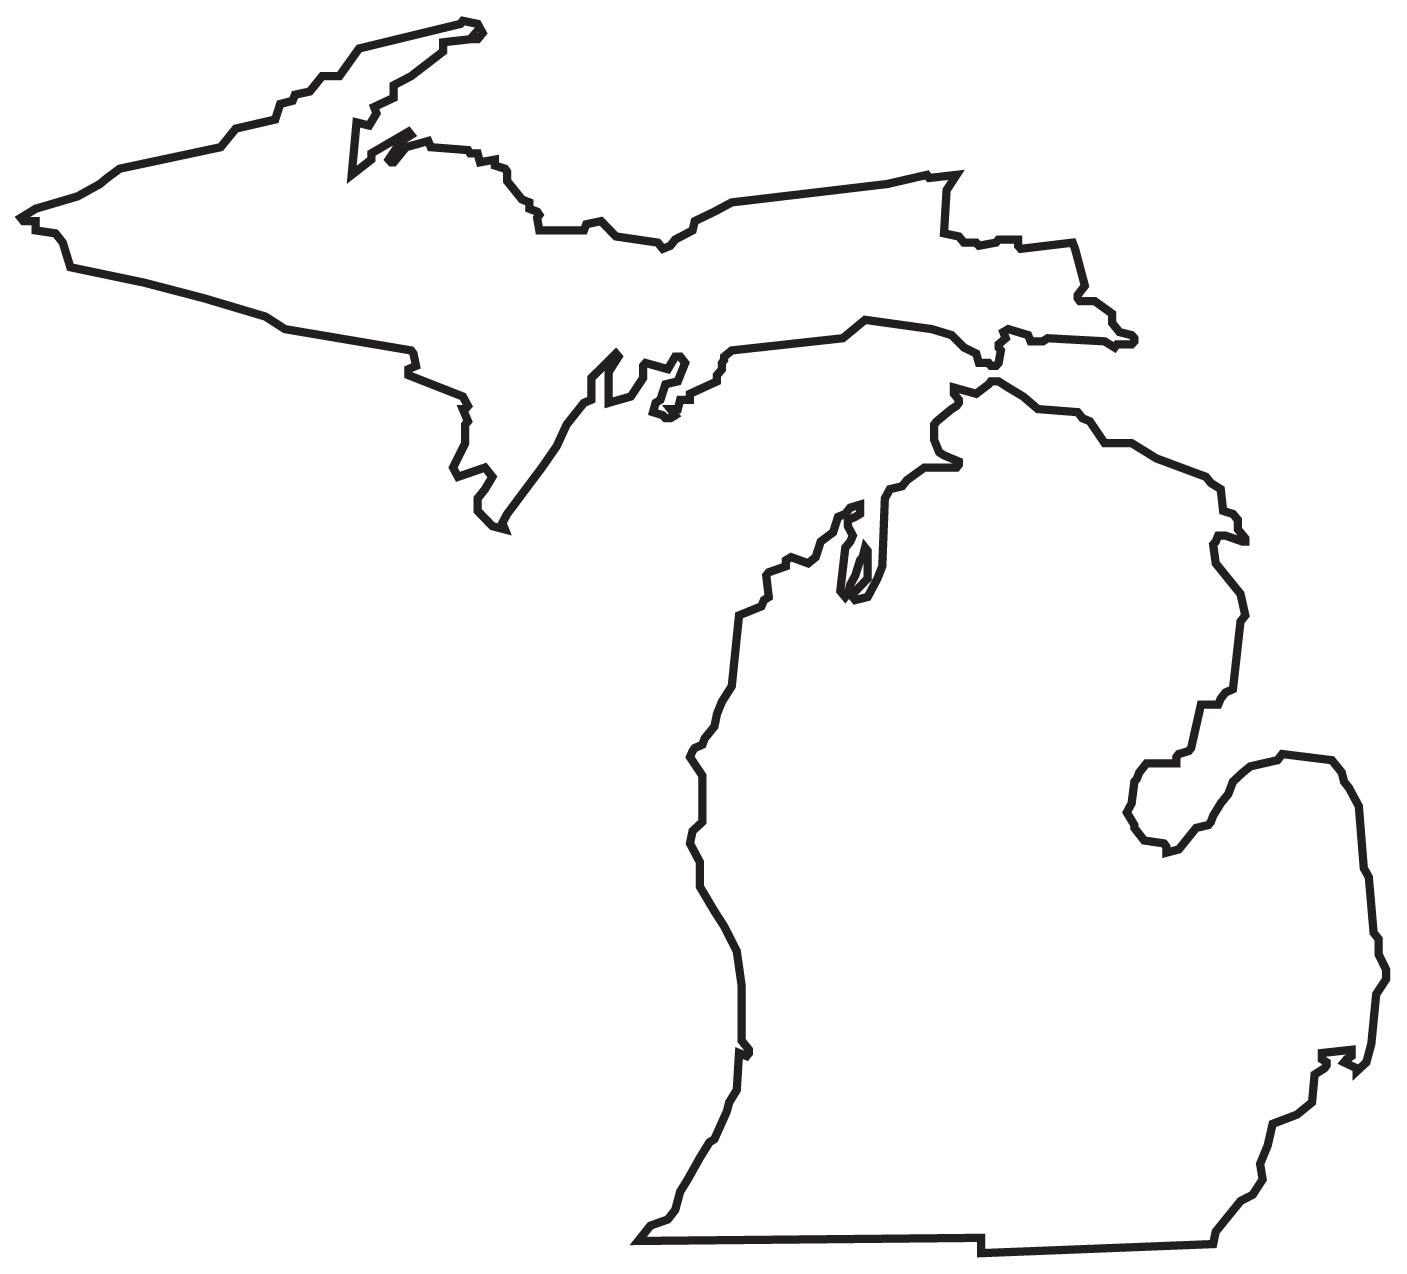 1407x1274 Michigan Lower Peninsula Outline Svg Free Download